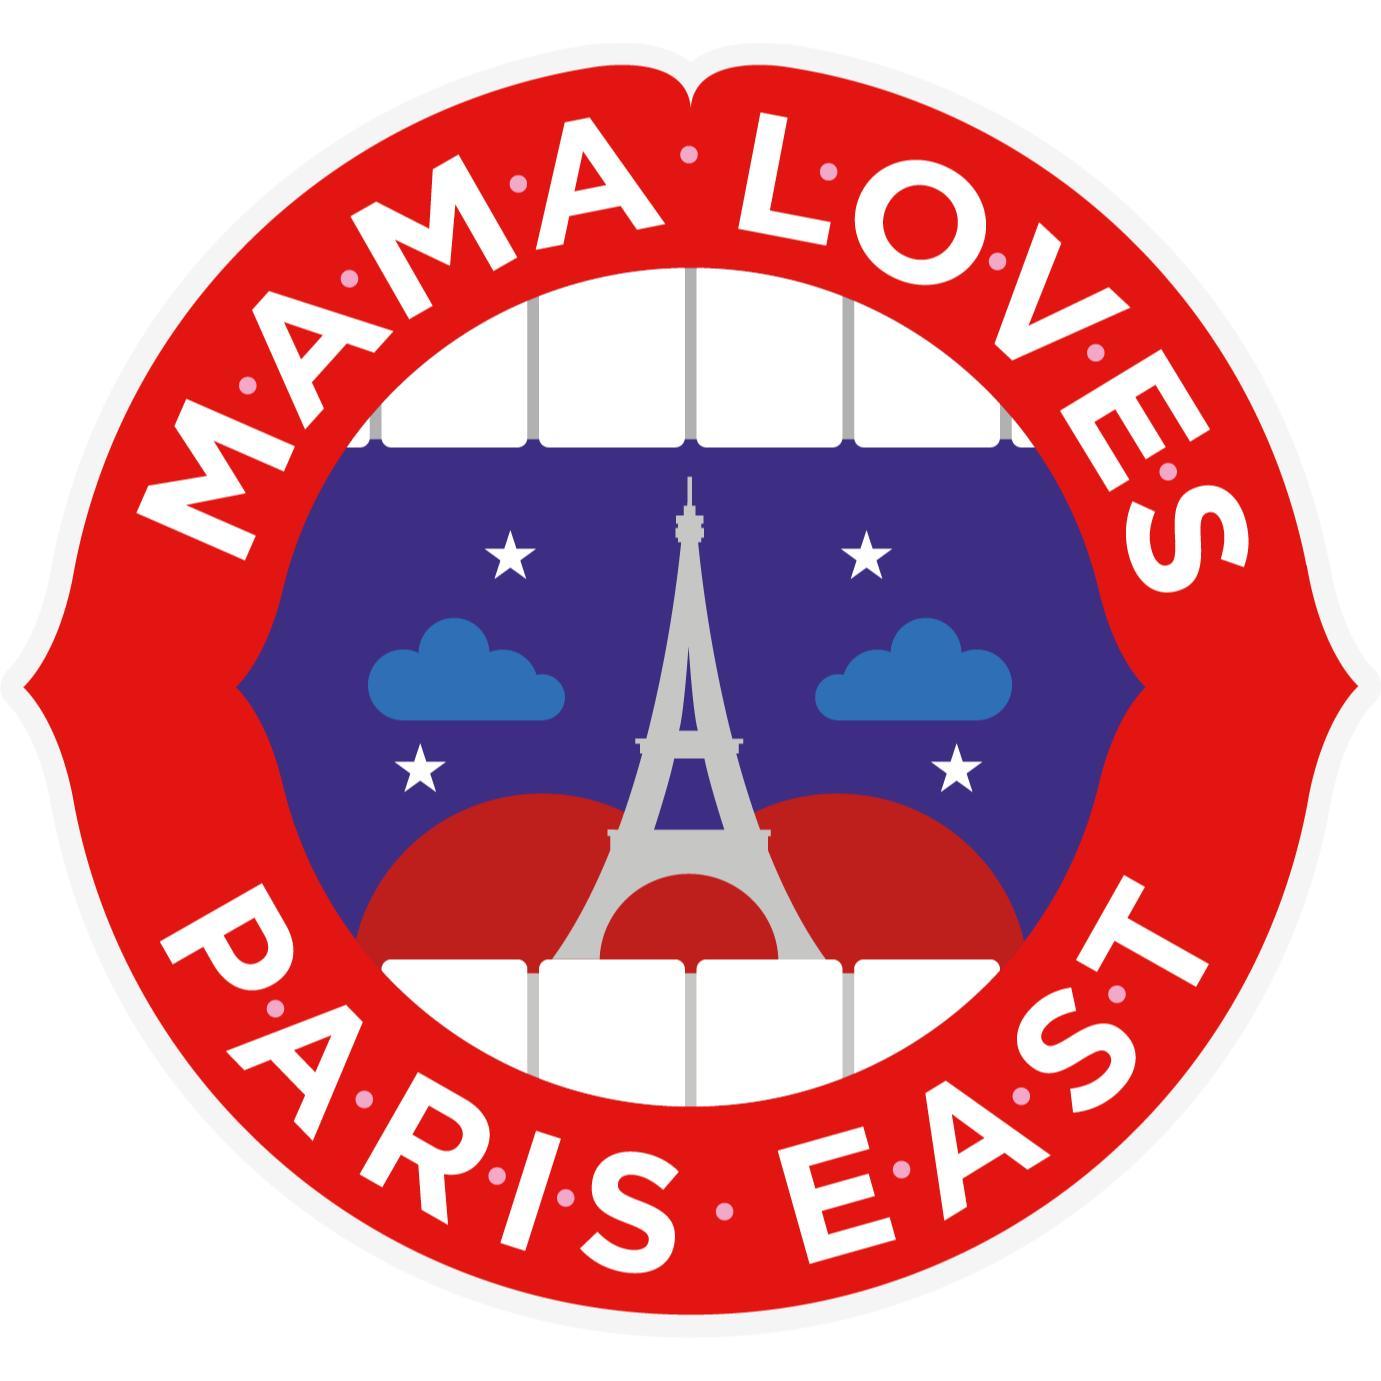 Mama Shelter Paris East Paris